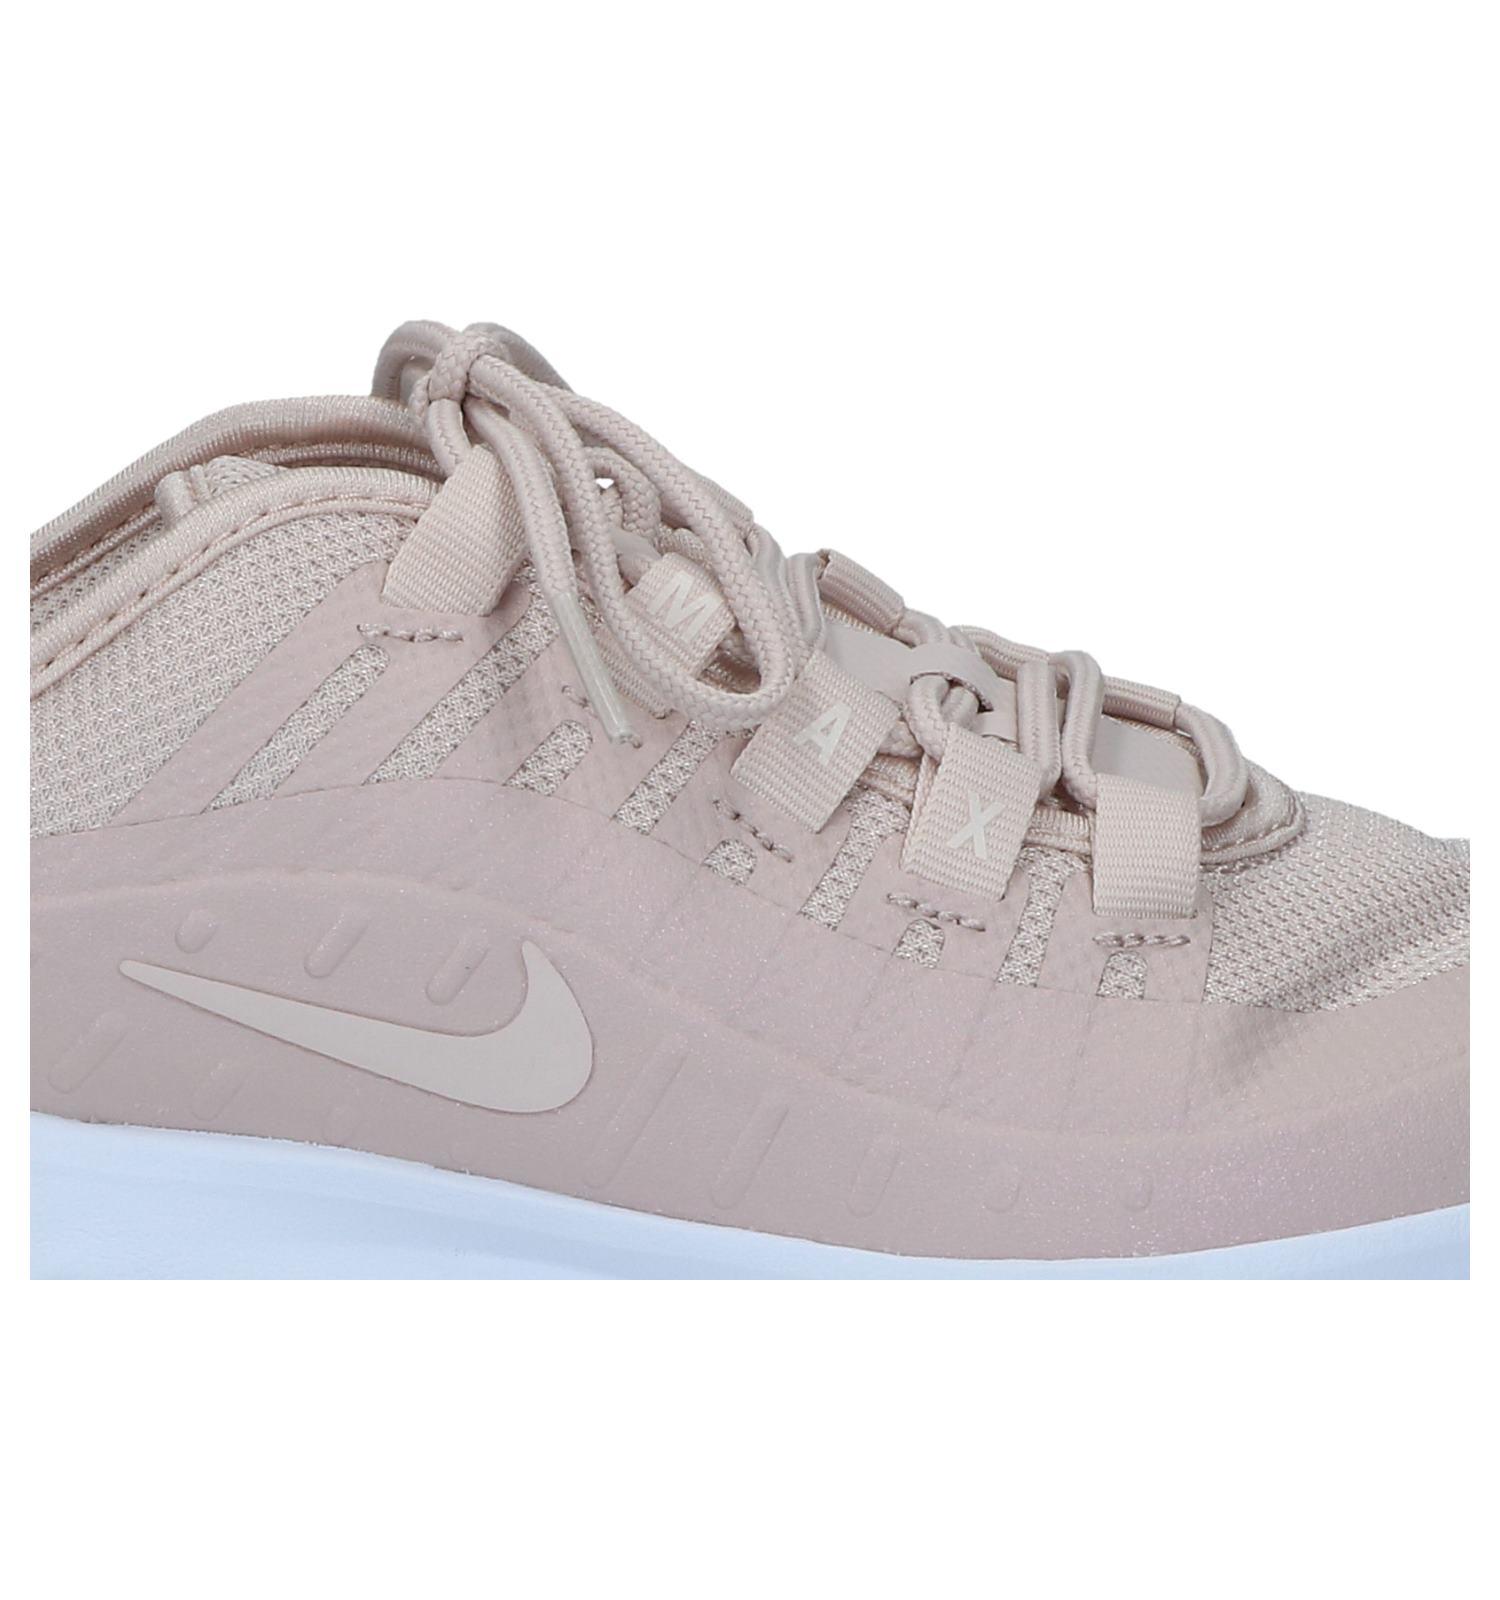 Bassesrose Retour be Et Nike ClairTorfs Baskets Livraison 2WDHIE9Y